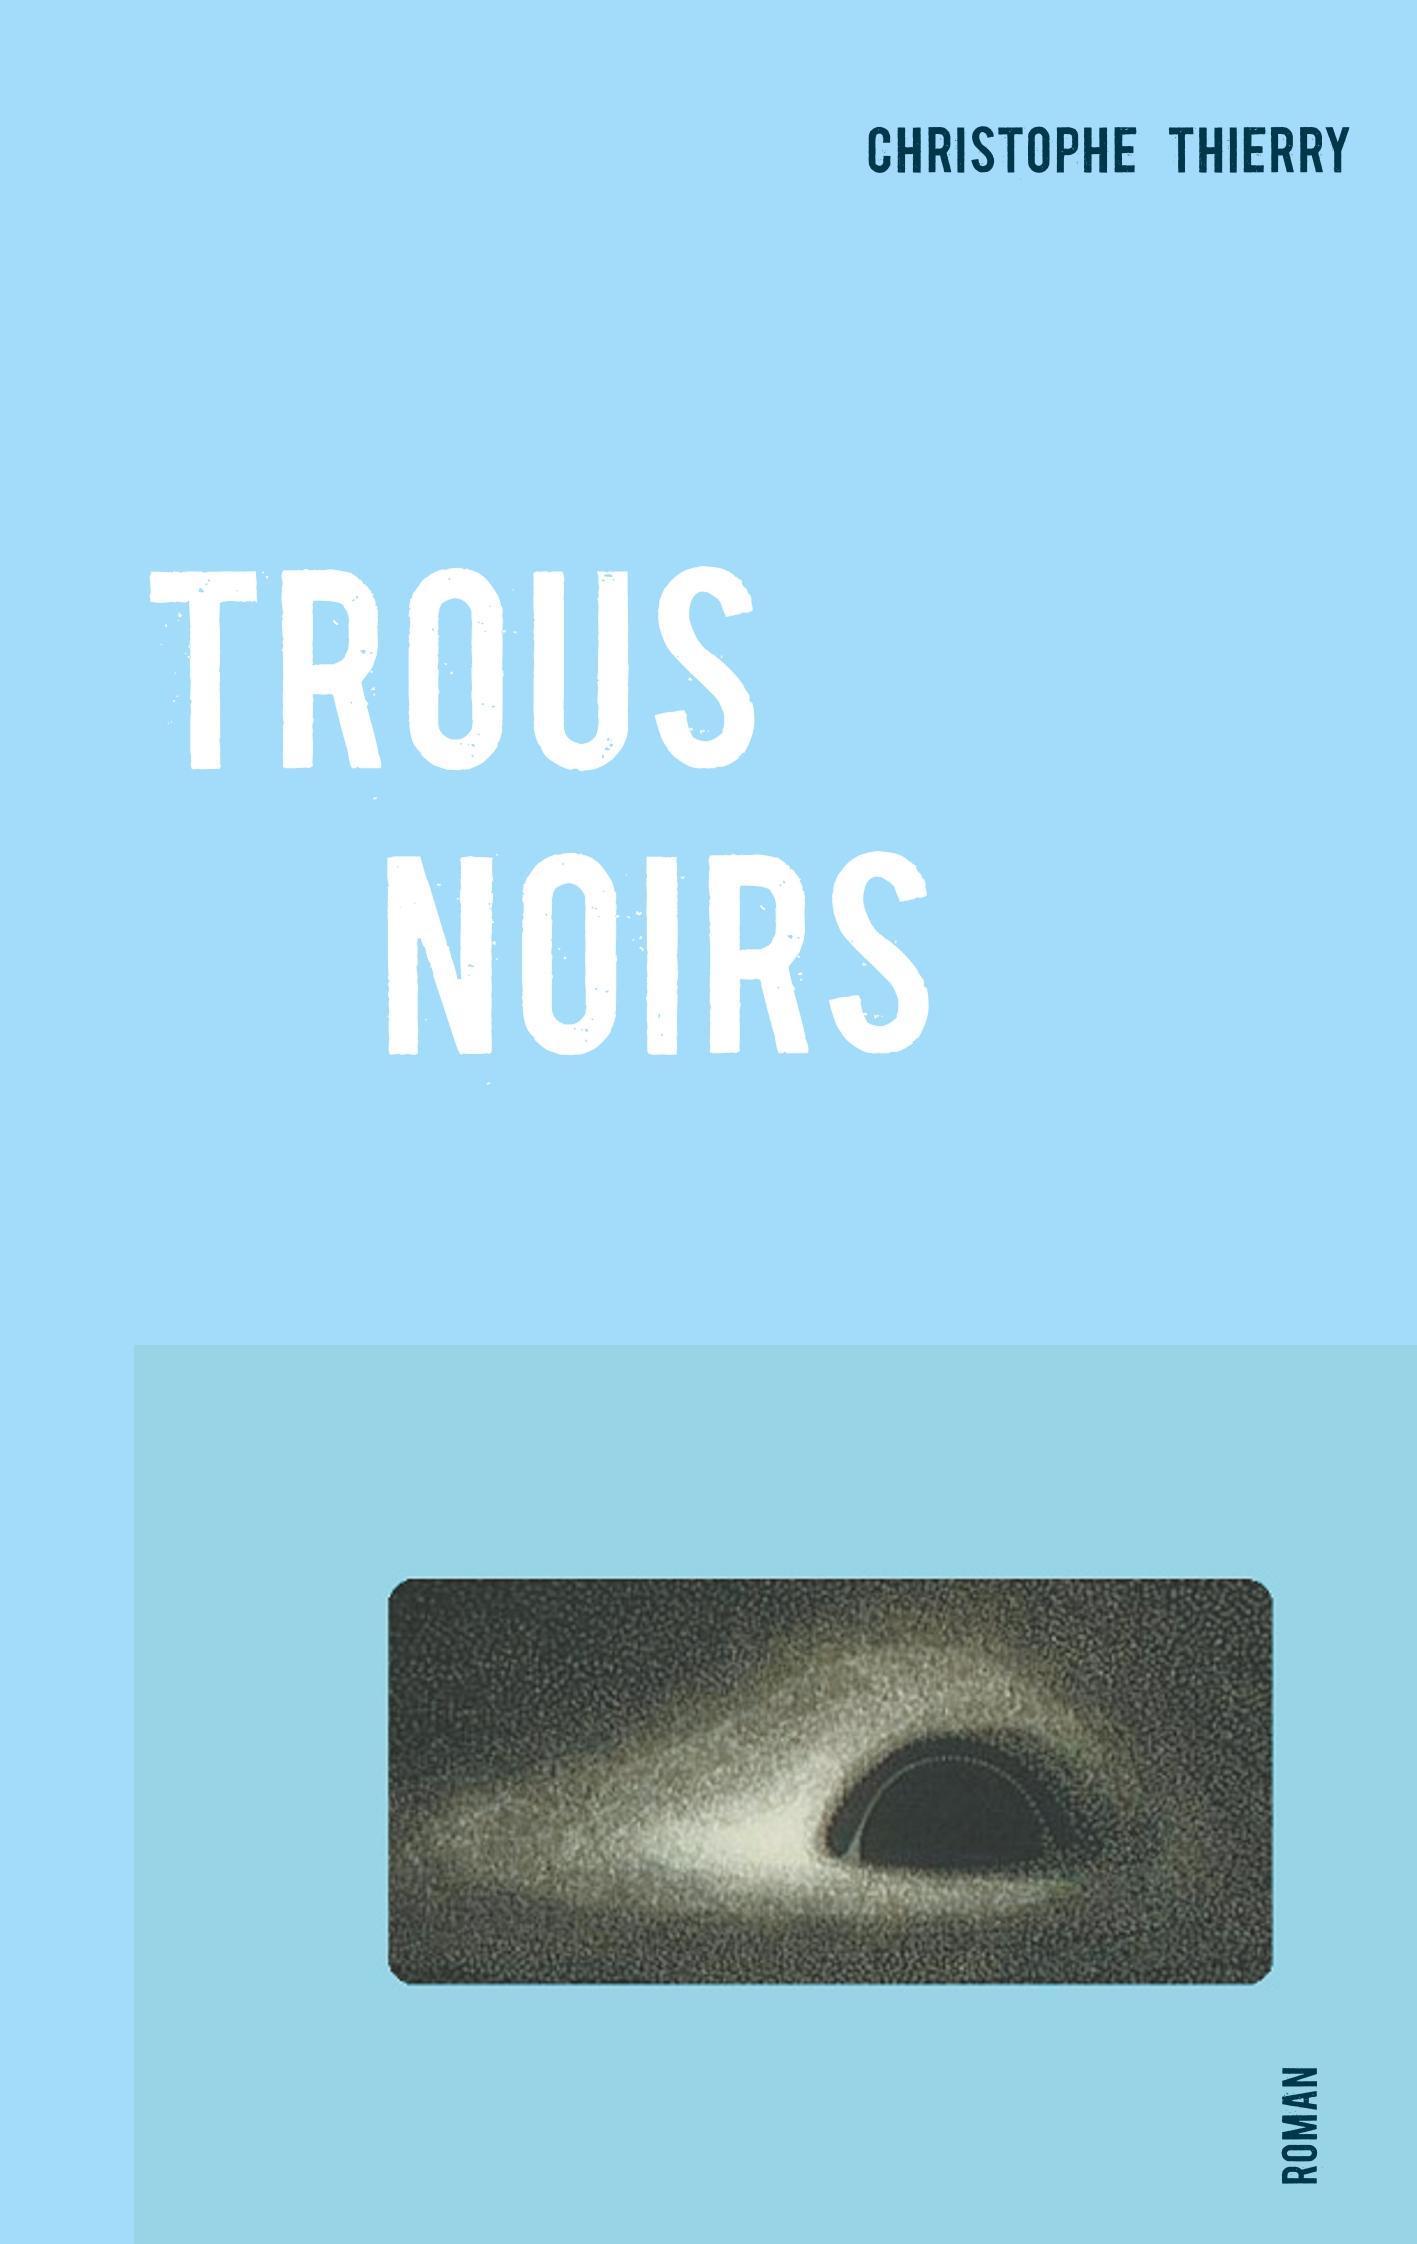 Trous Noirs  Christophe Thierry  Taschenbuch  Paperback  Französisch  2018 - Thierry, Christophe